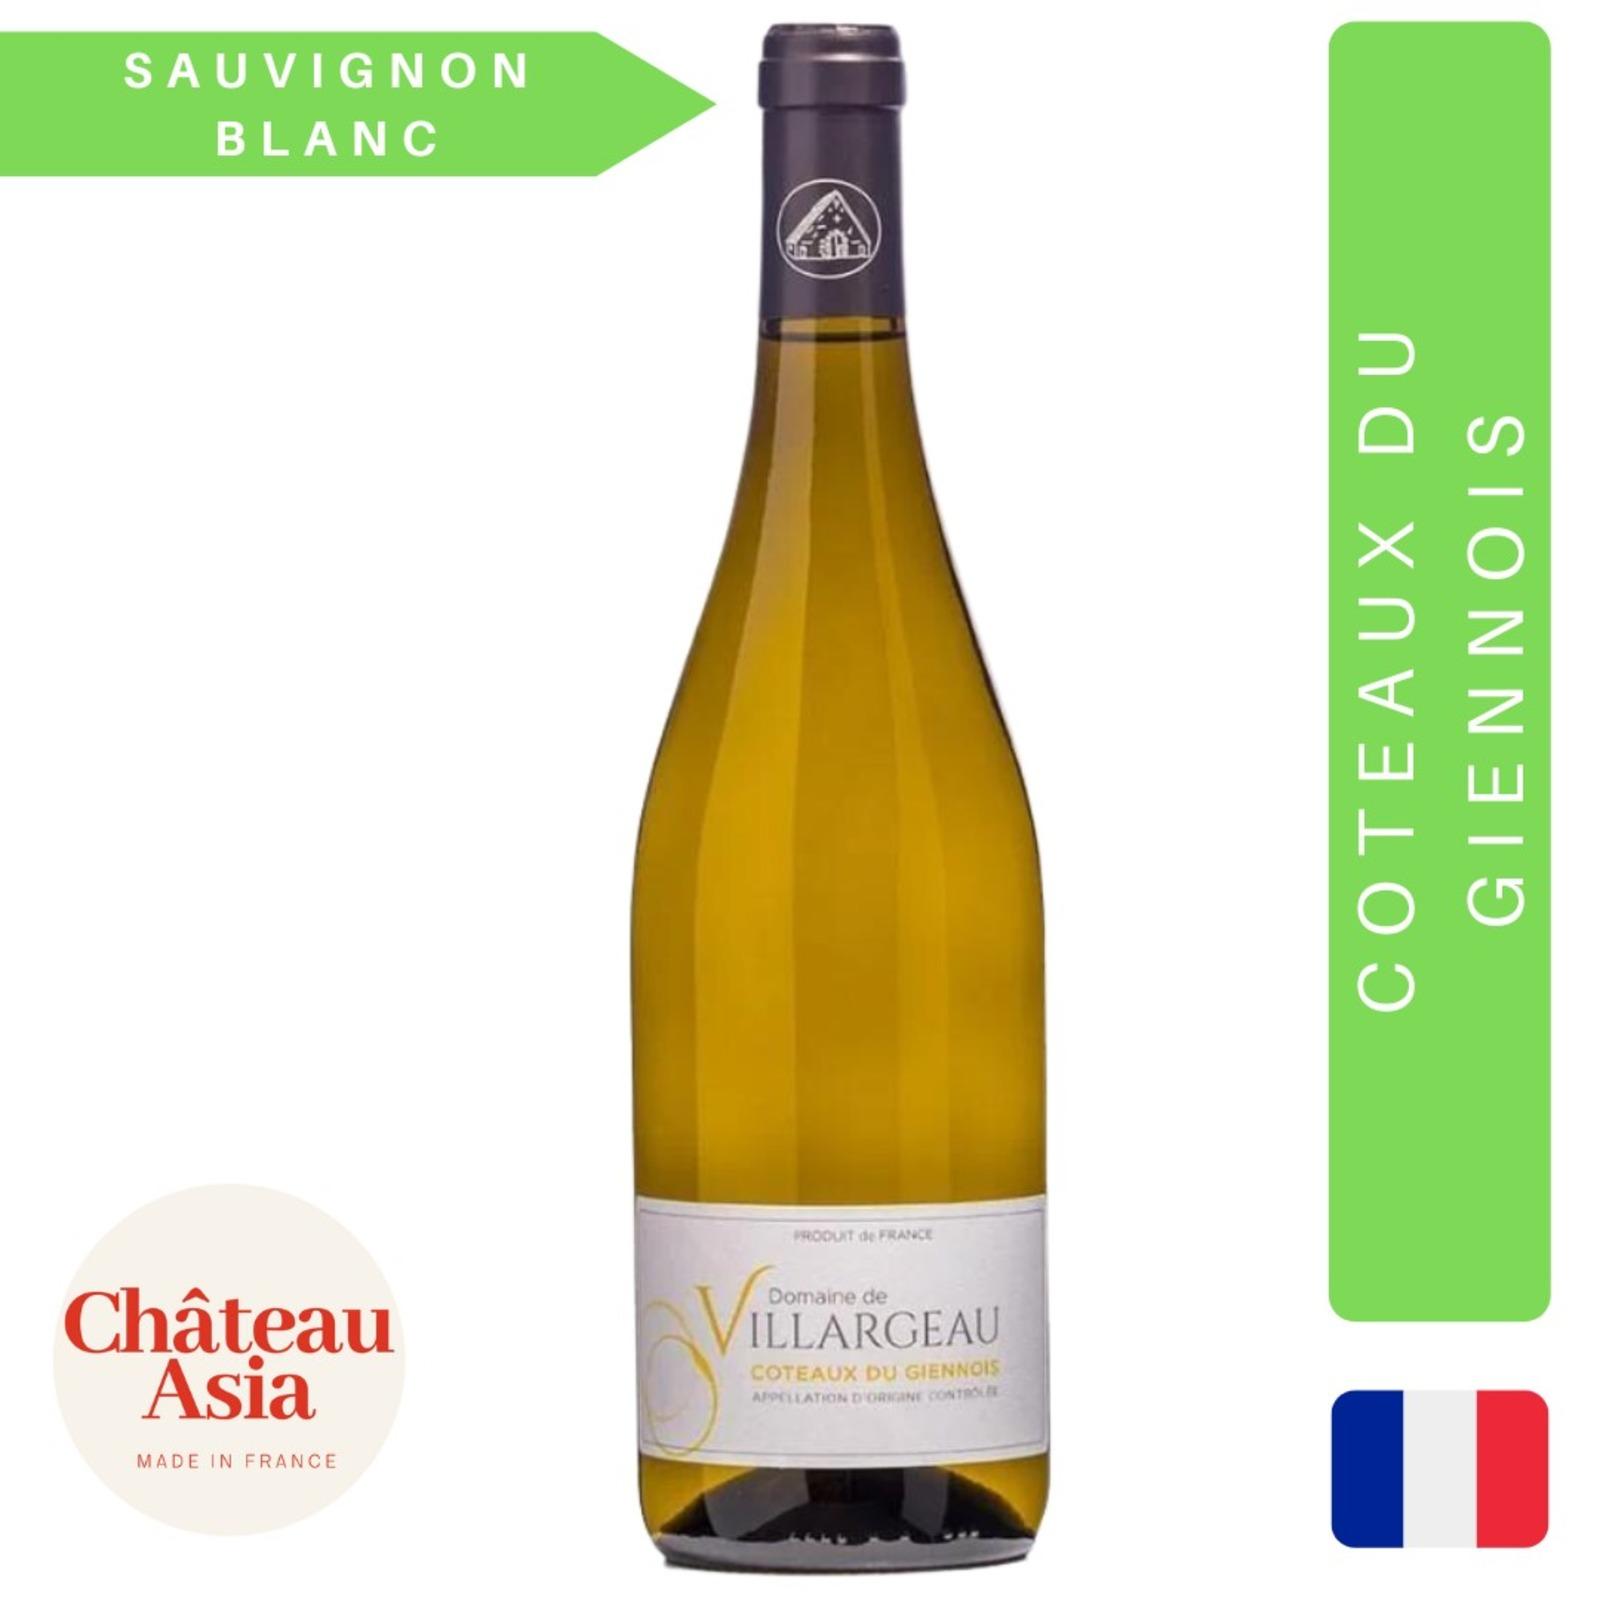 Domaine de Villargeau - Sauvignon Blanc - White Wine